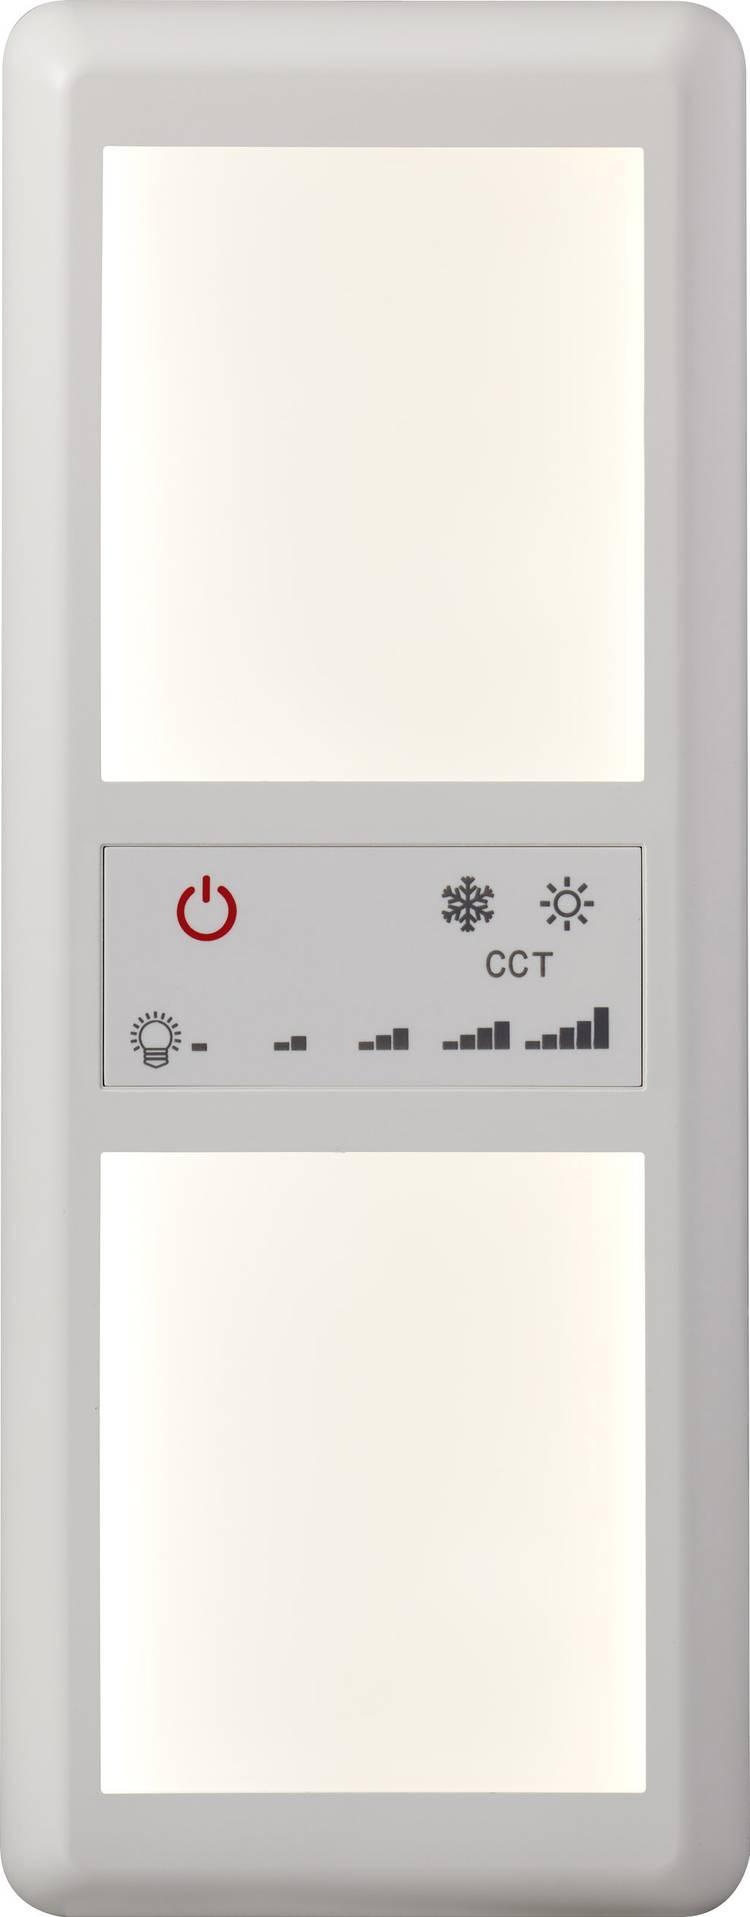 Image of Basetech C2-259D Dual LED Touch Interieurlamp 12 V/DC, 24 V/DC LED (b x h x d) 109.5 x 16 x 279.5 mm